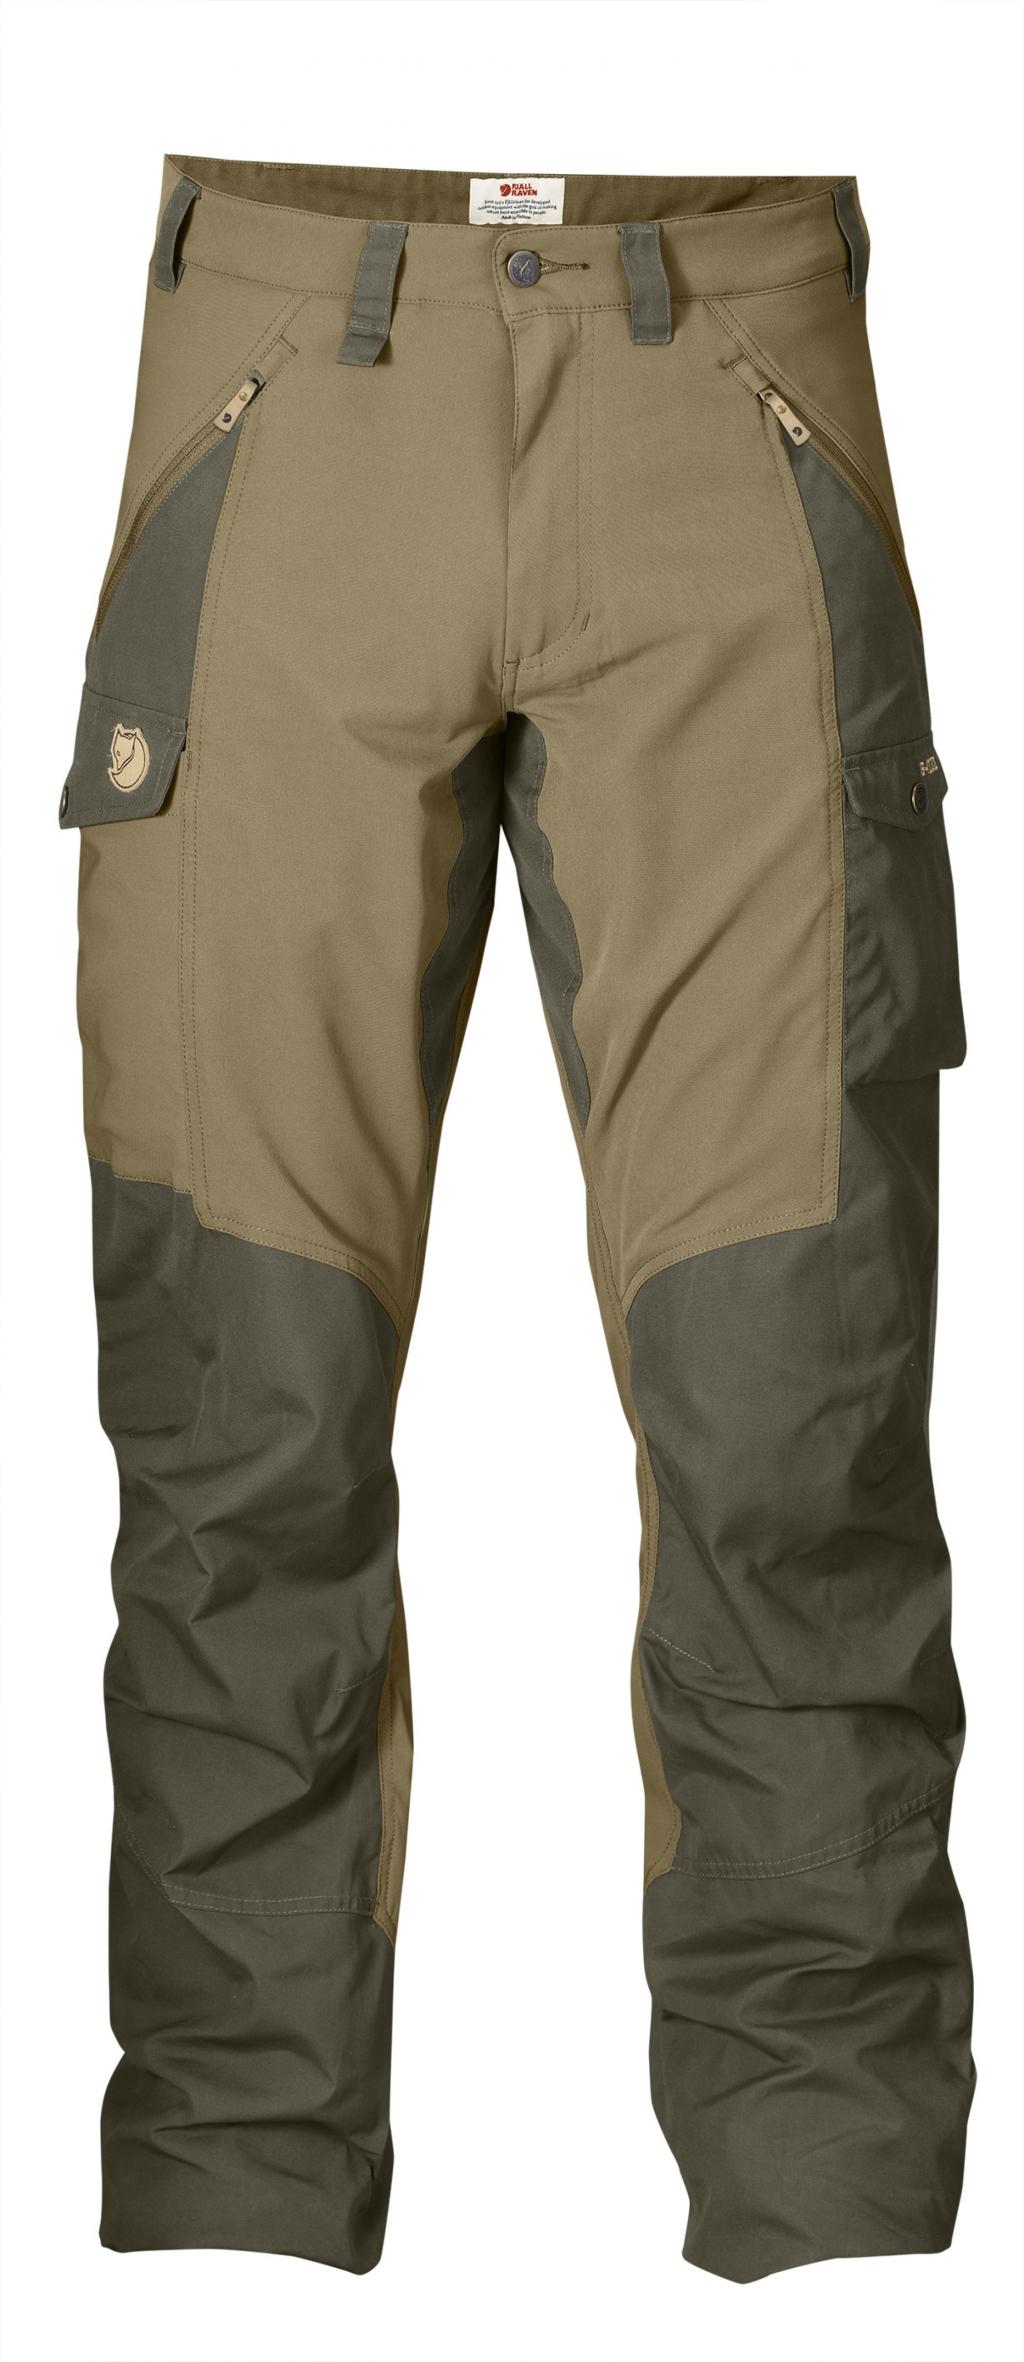 FjallRaven Abisko Trousers Sand-30